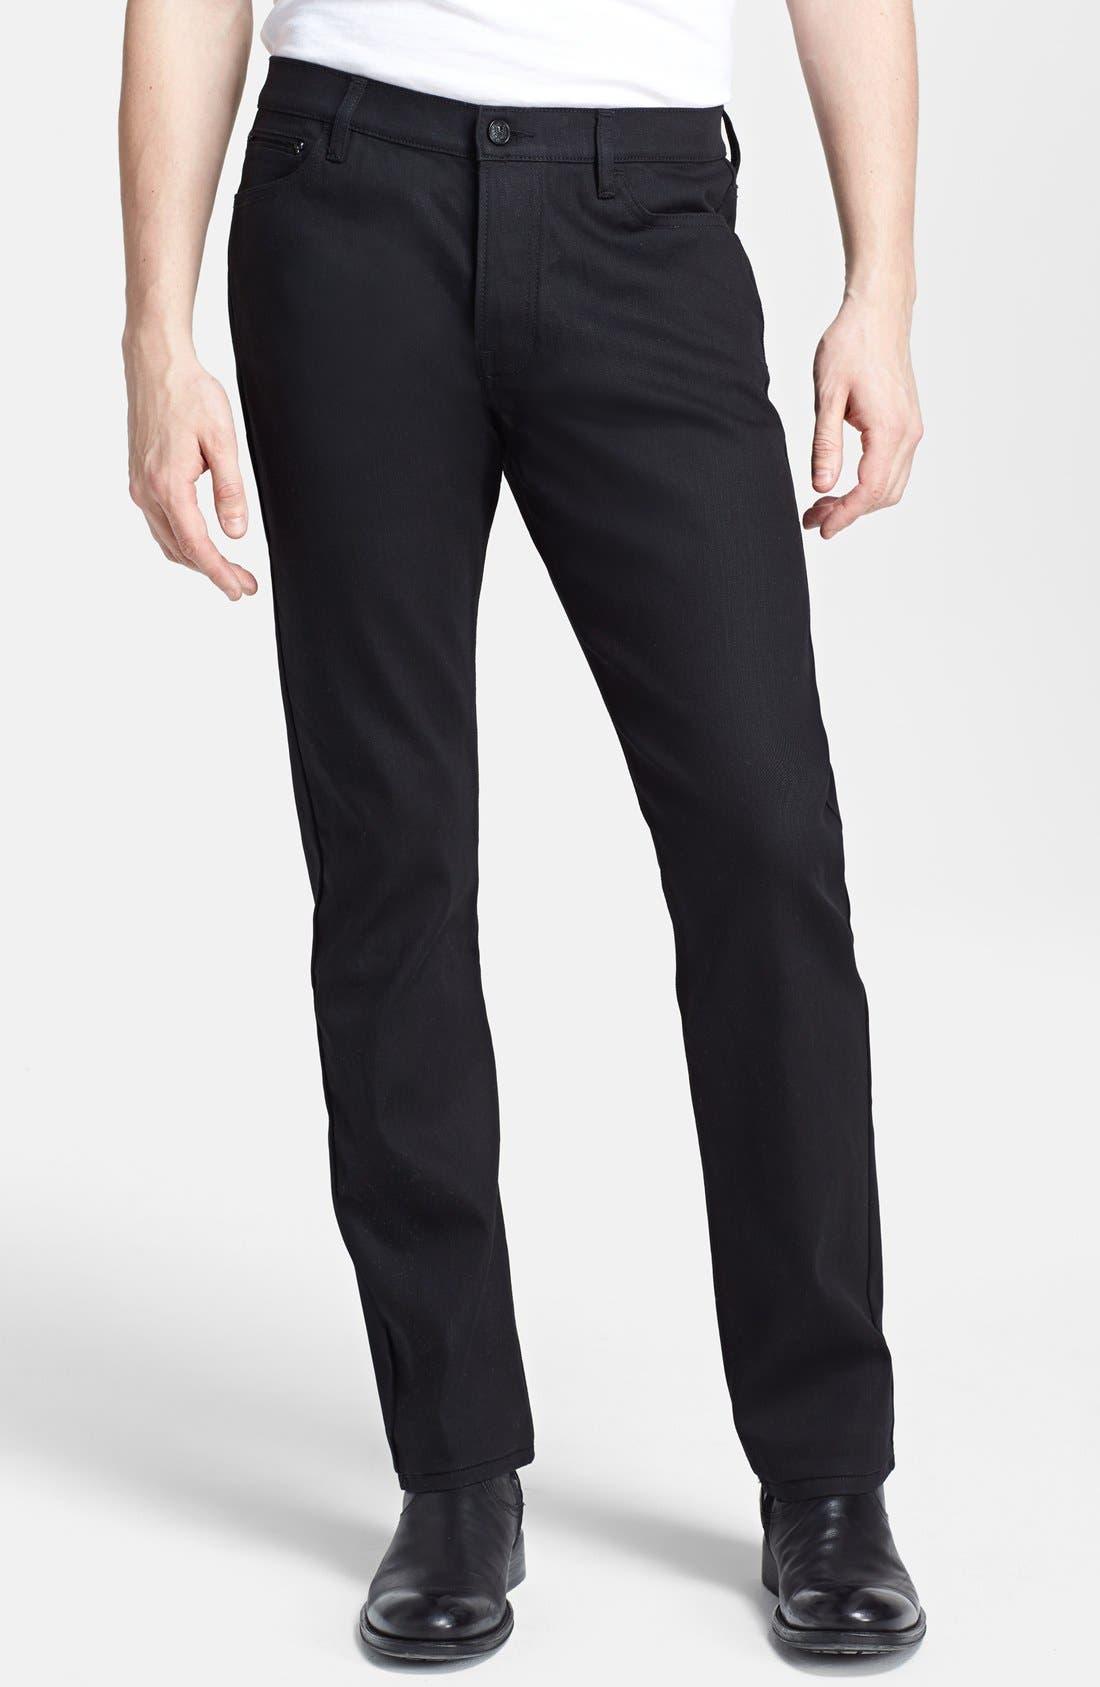 Main Image - The Kooples 'Core' Slim Fit Pants